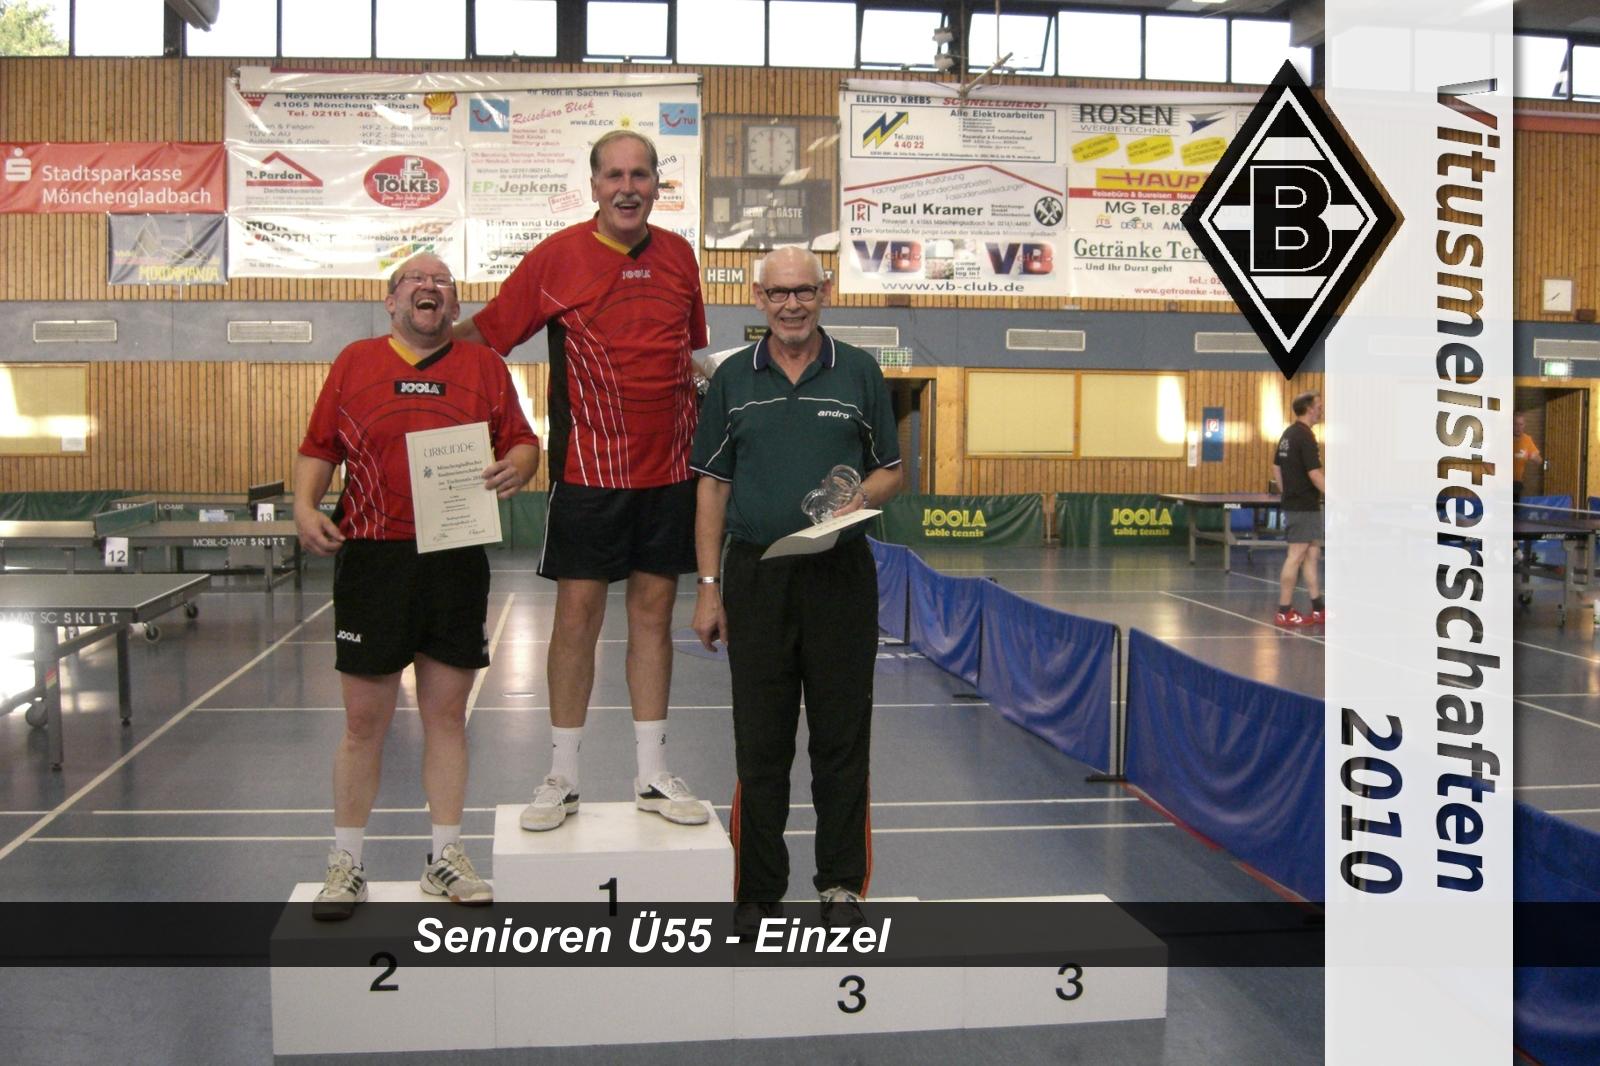 SeniorenU55 Einzel